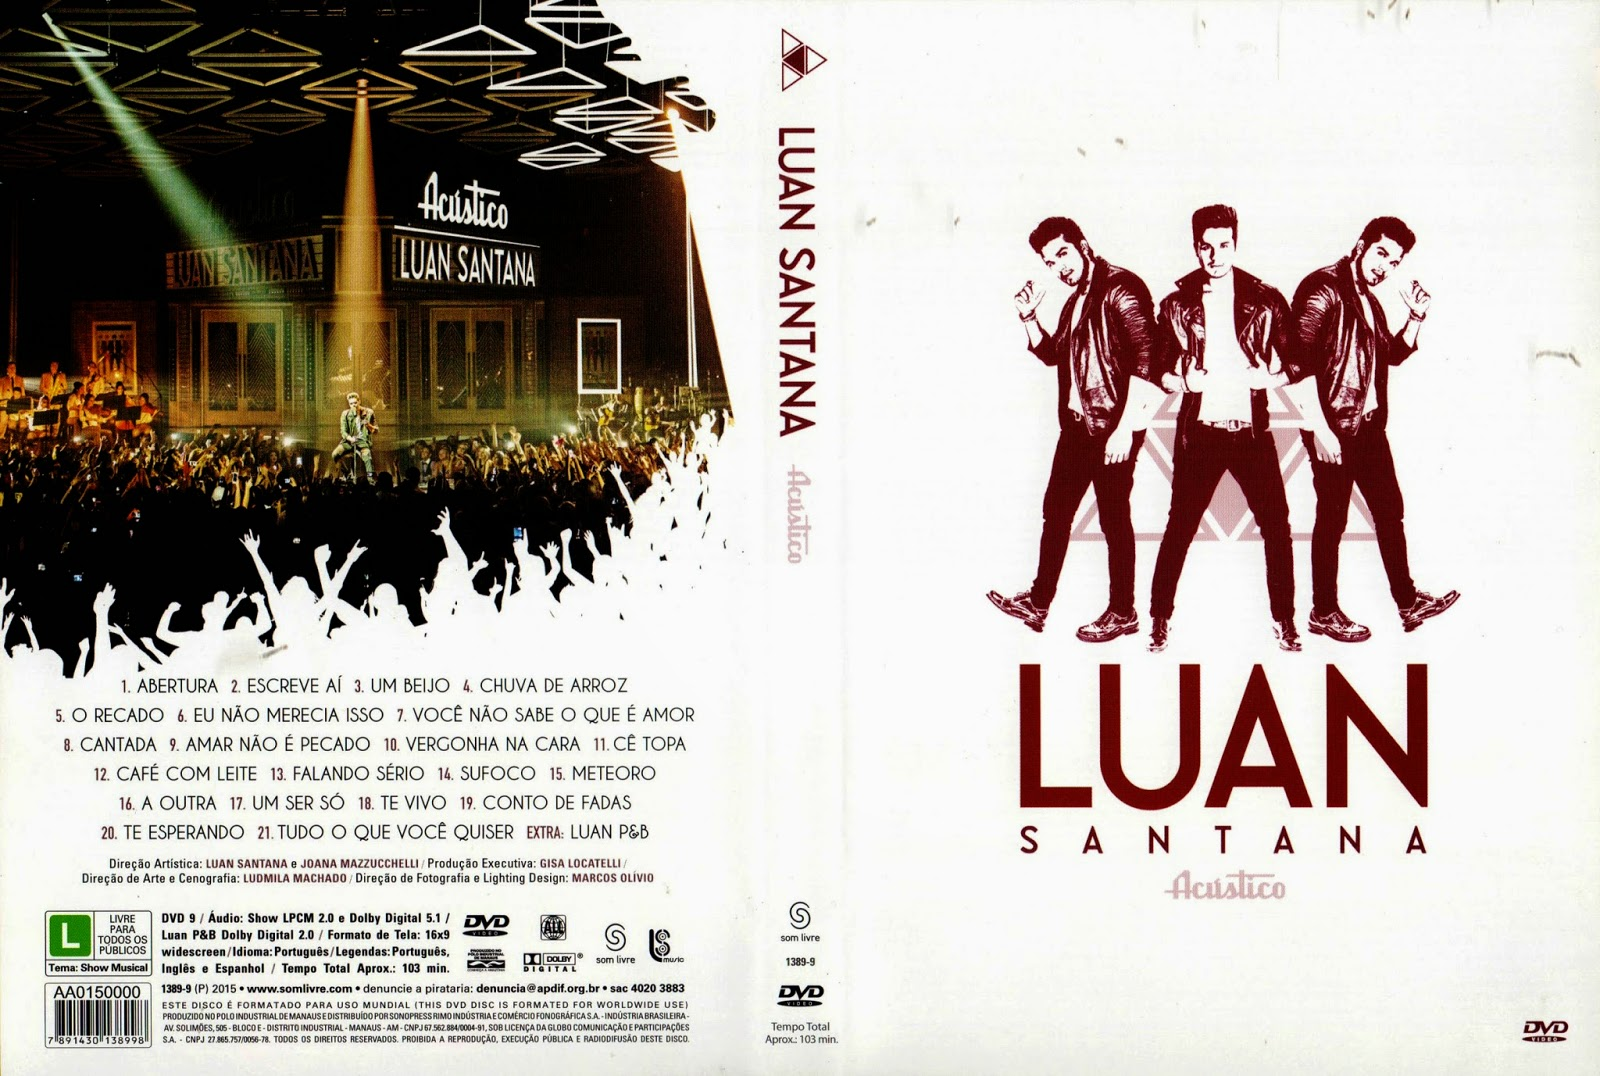 Download Luan Santana Acústico DVD-R Luan Santana Acustico XANDAODOWNLOAD